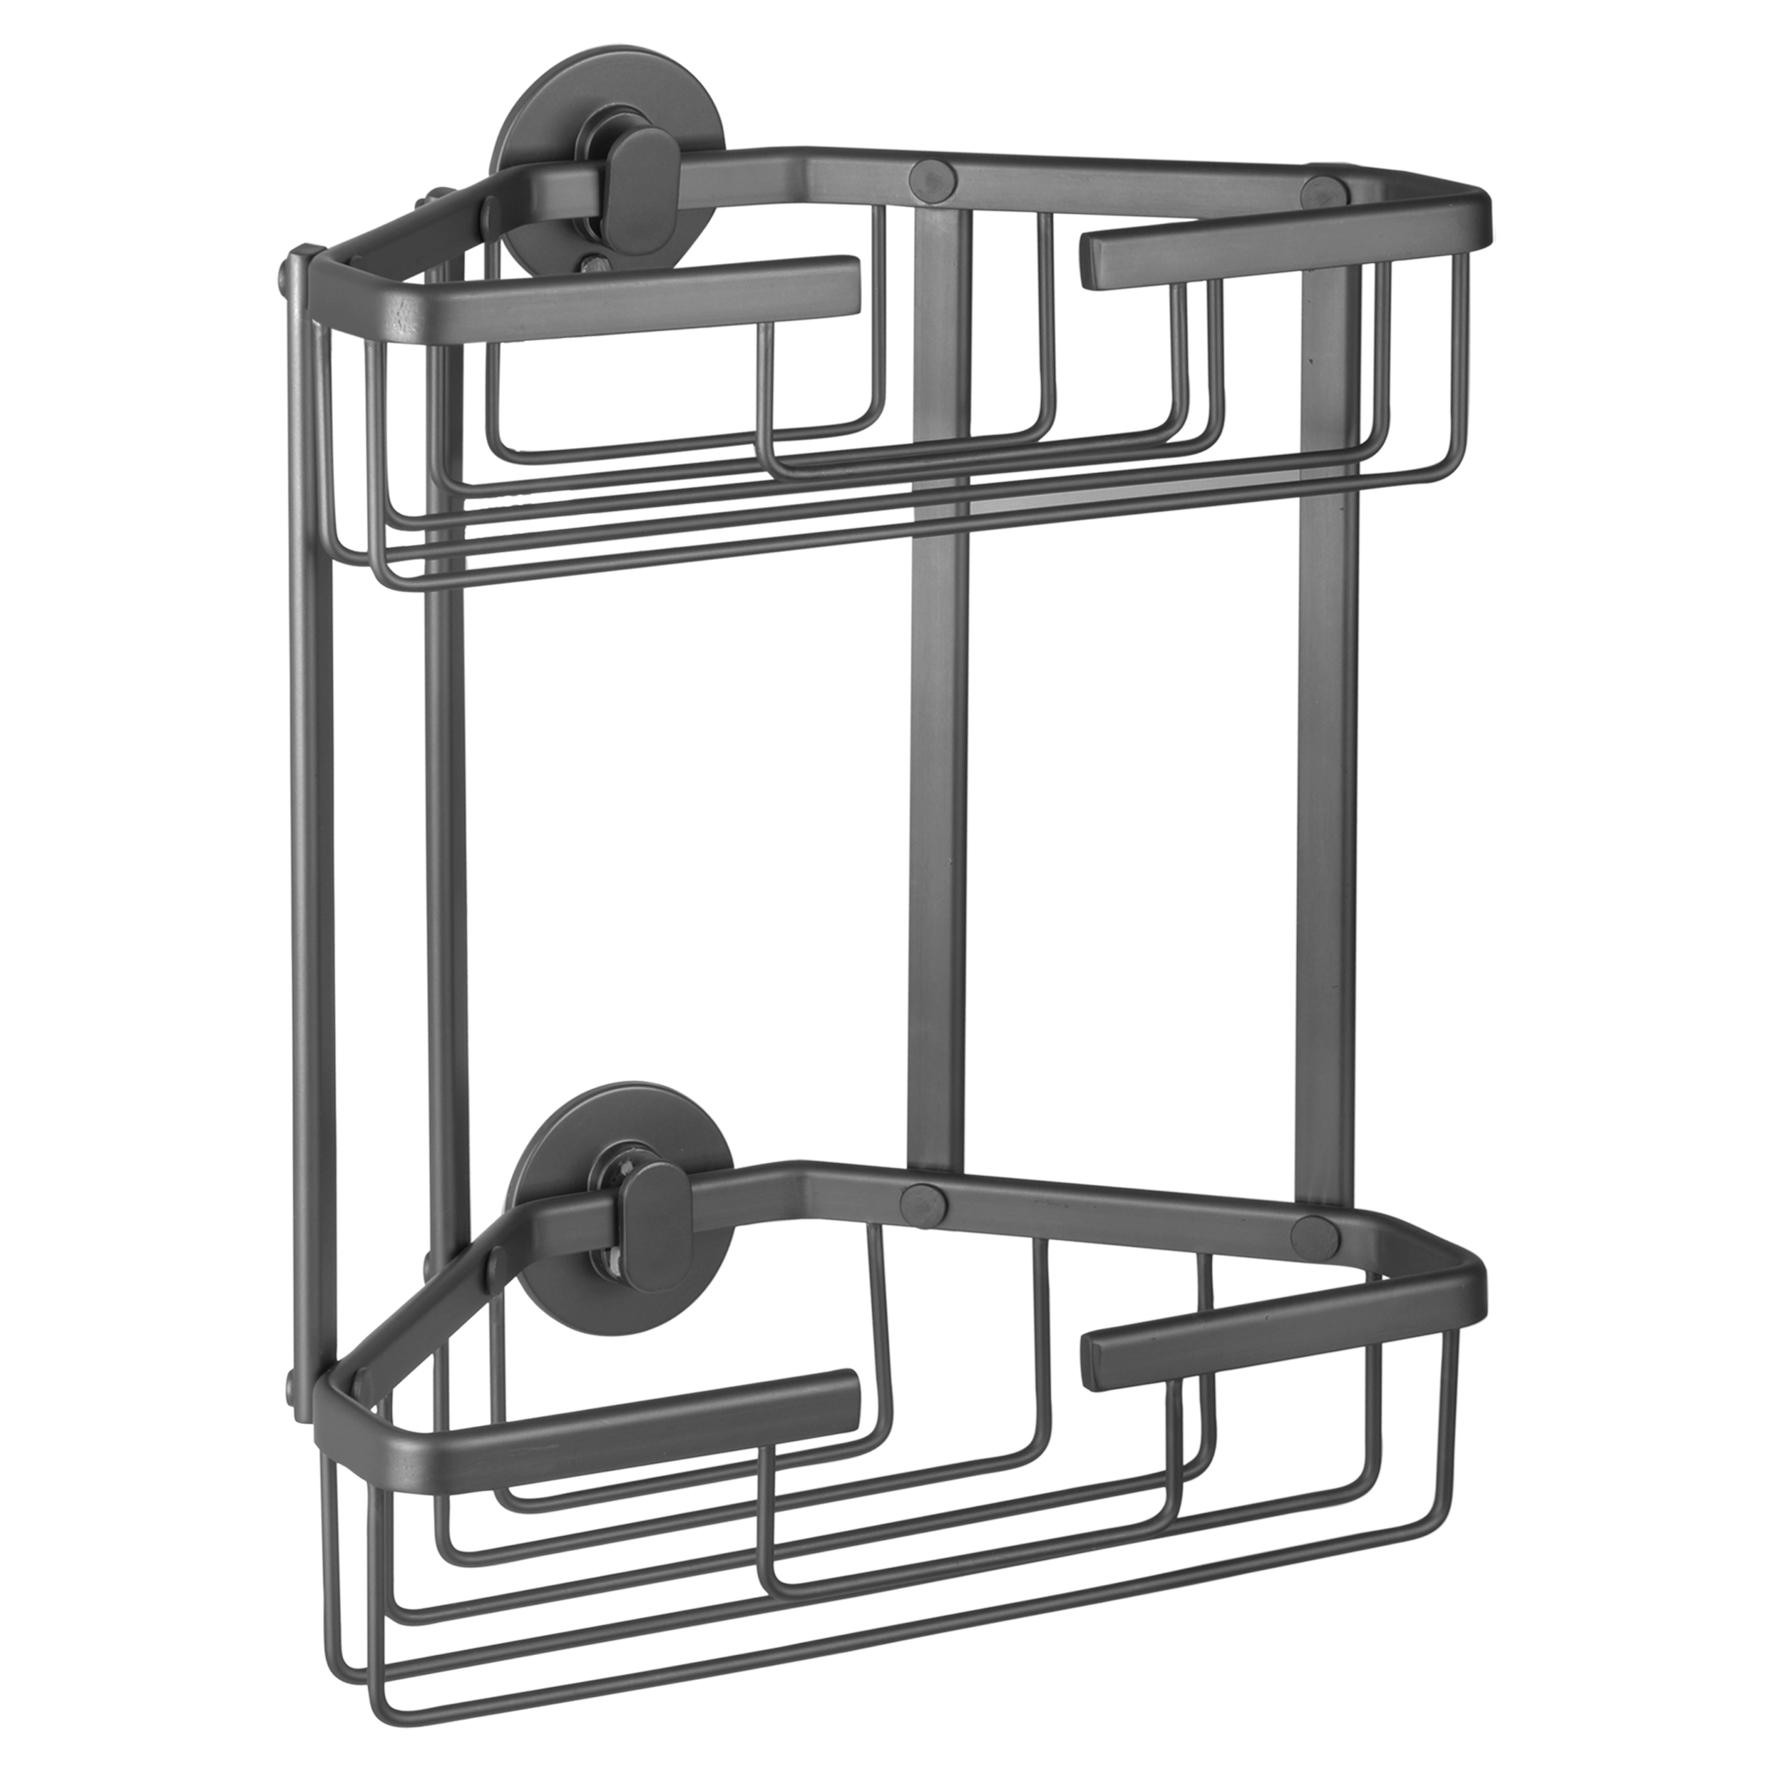 Differnz draadmand - driehoek 2-laags - aluminium - gun metal